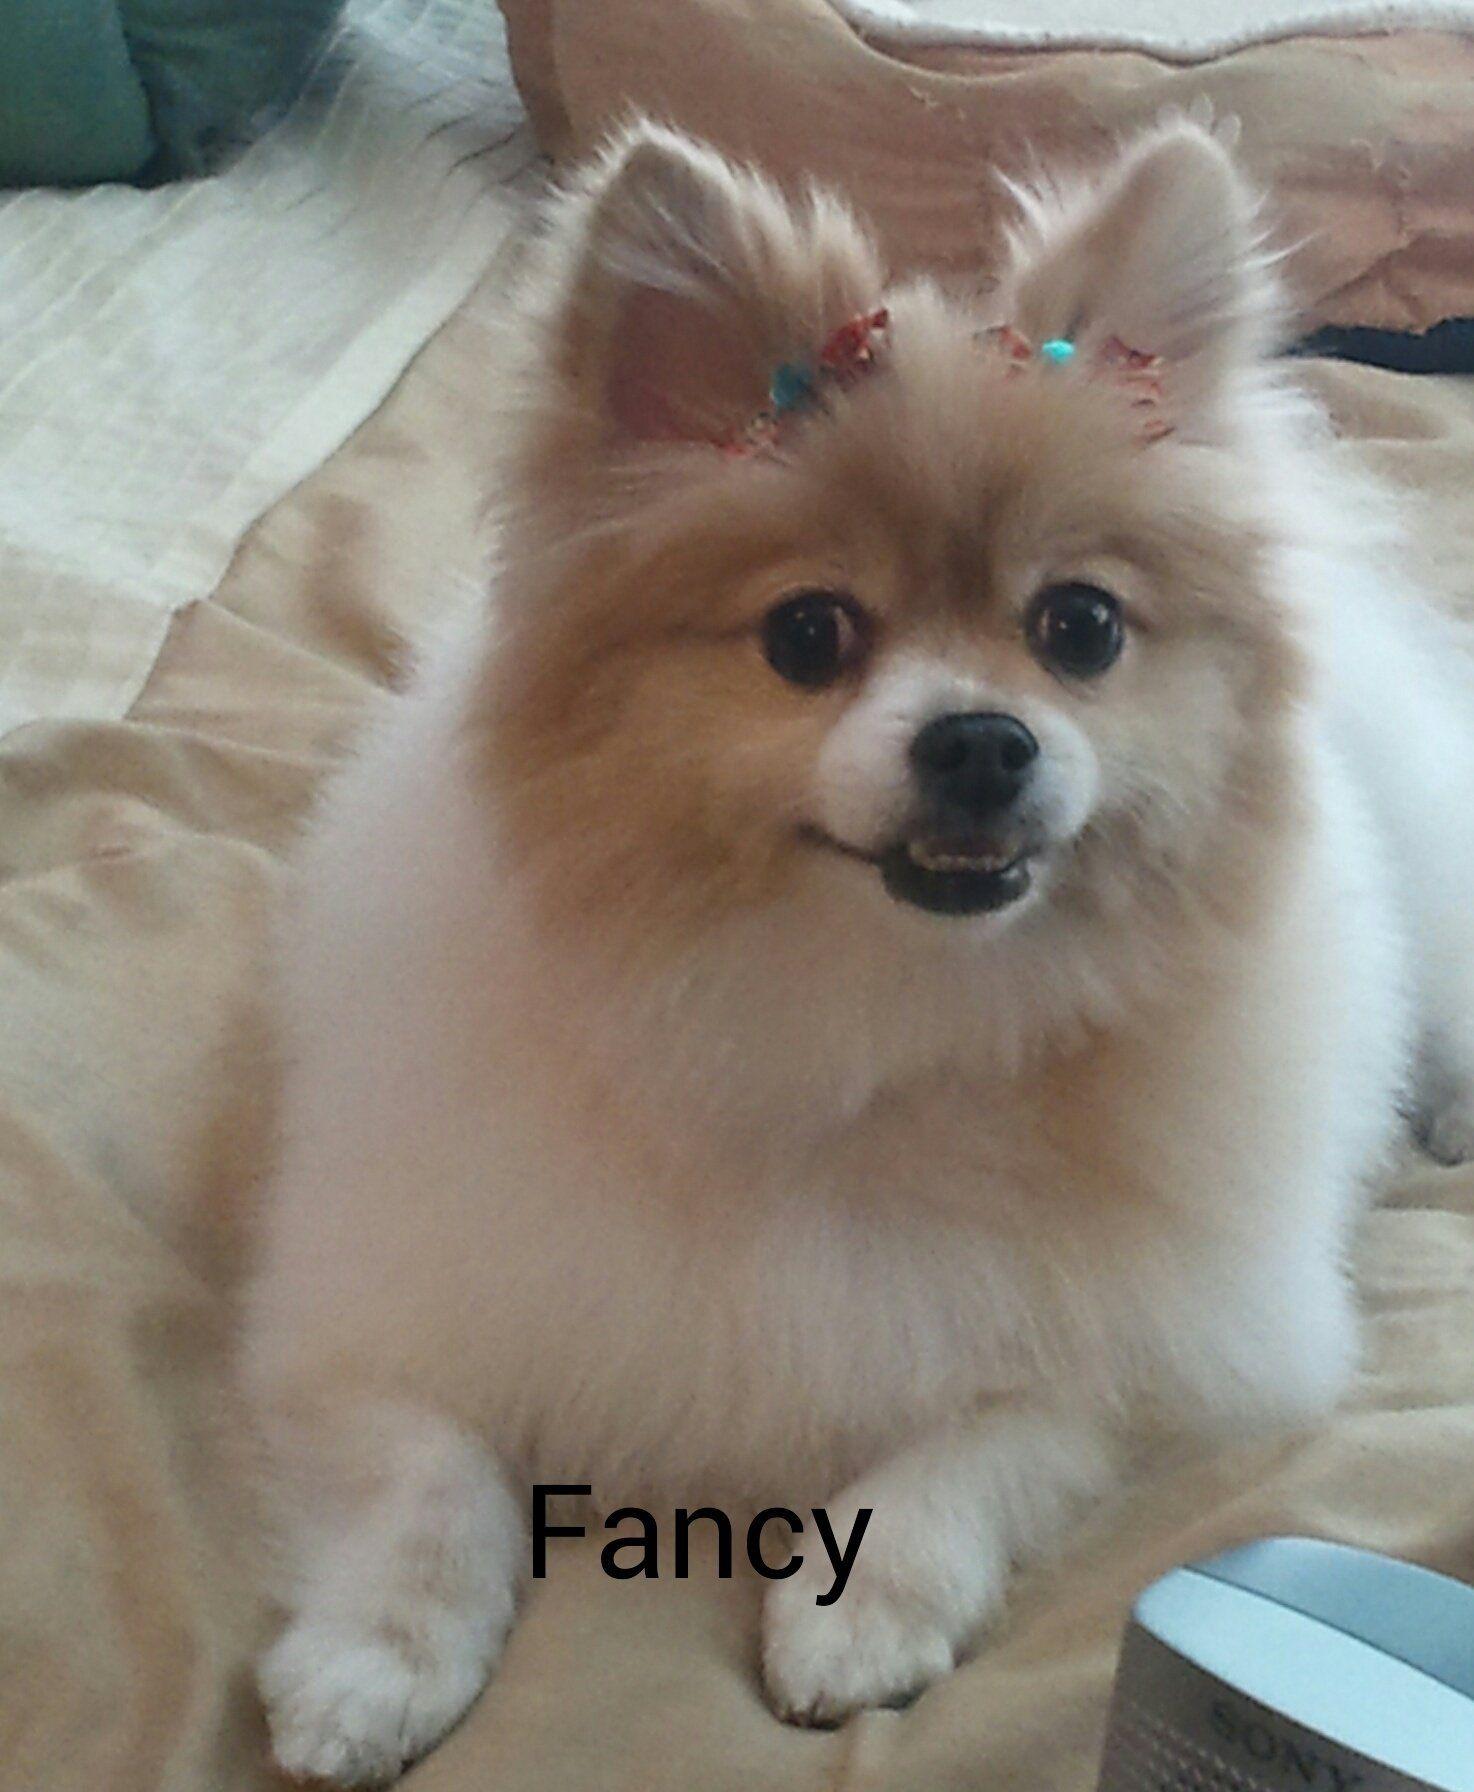 Lol Them Teeth Tho Pompom Pomeranians Huskys And Pomskys